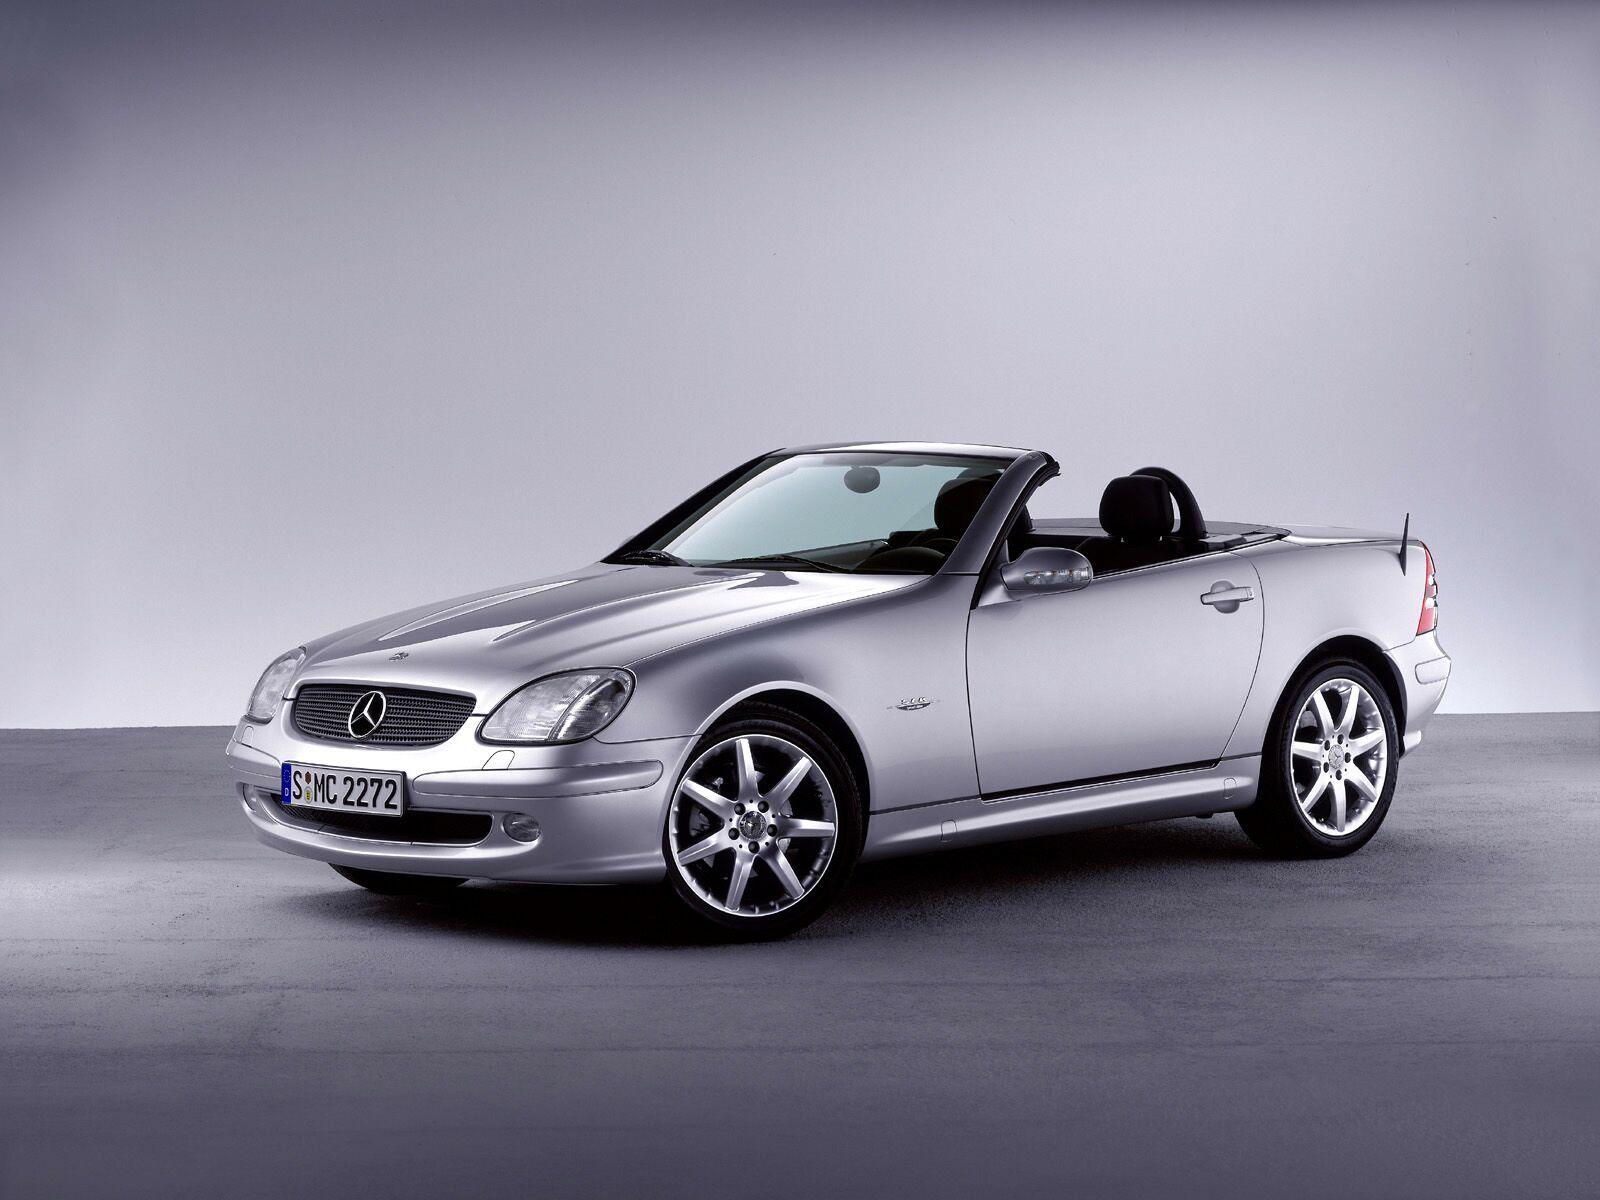 Mercedes Benz Slk Class R170